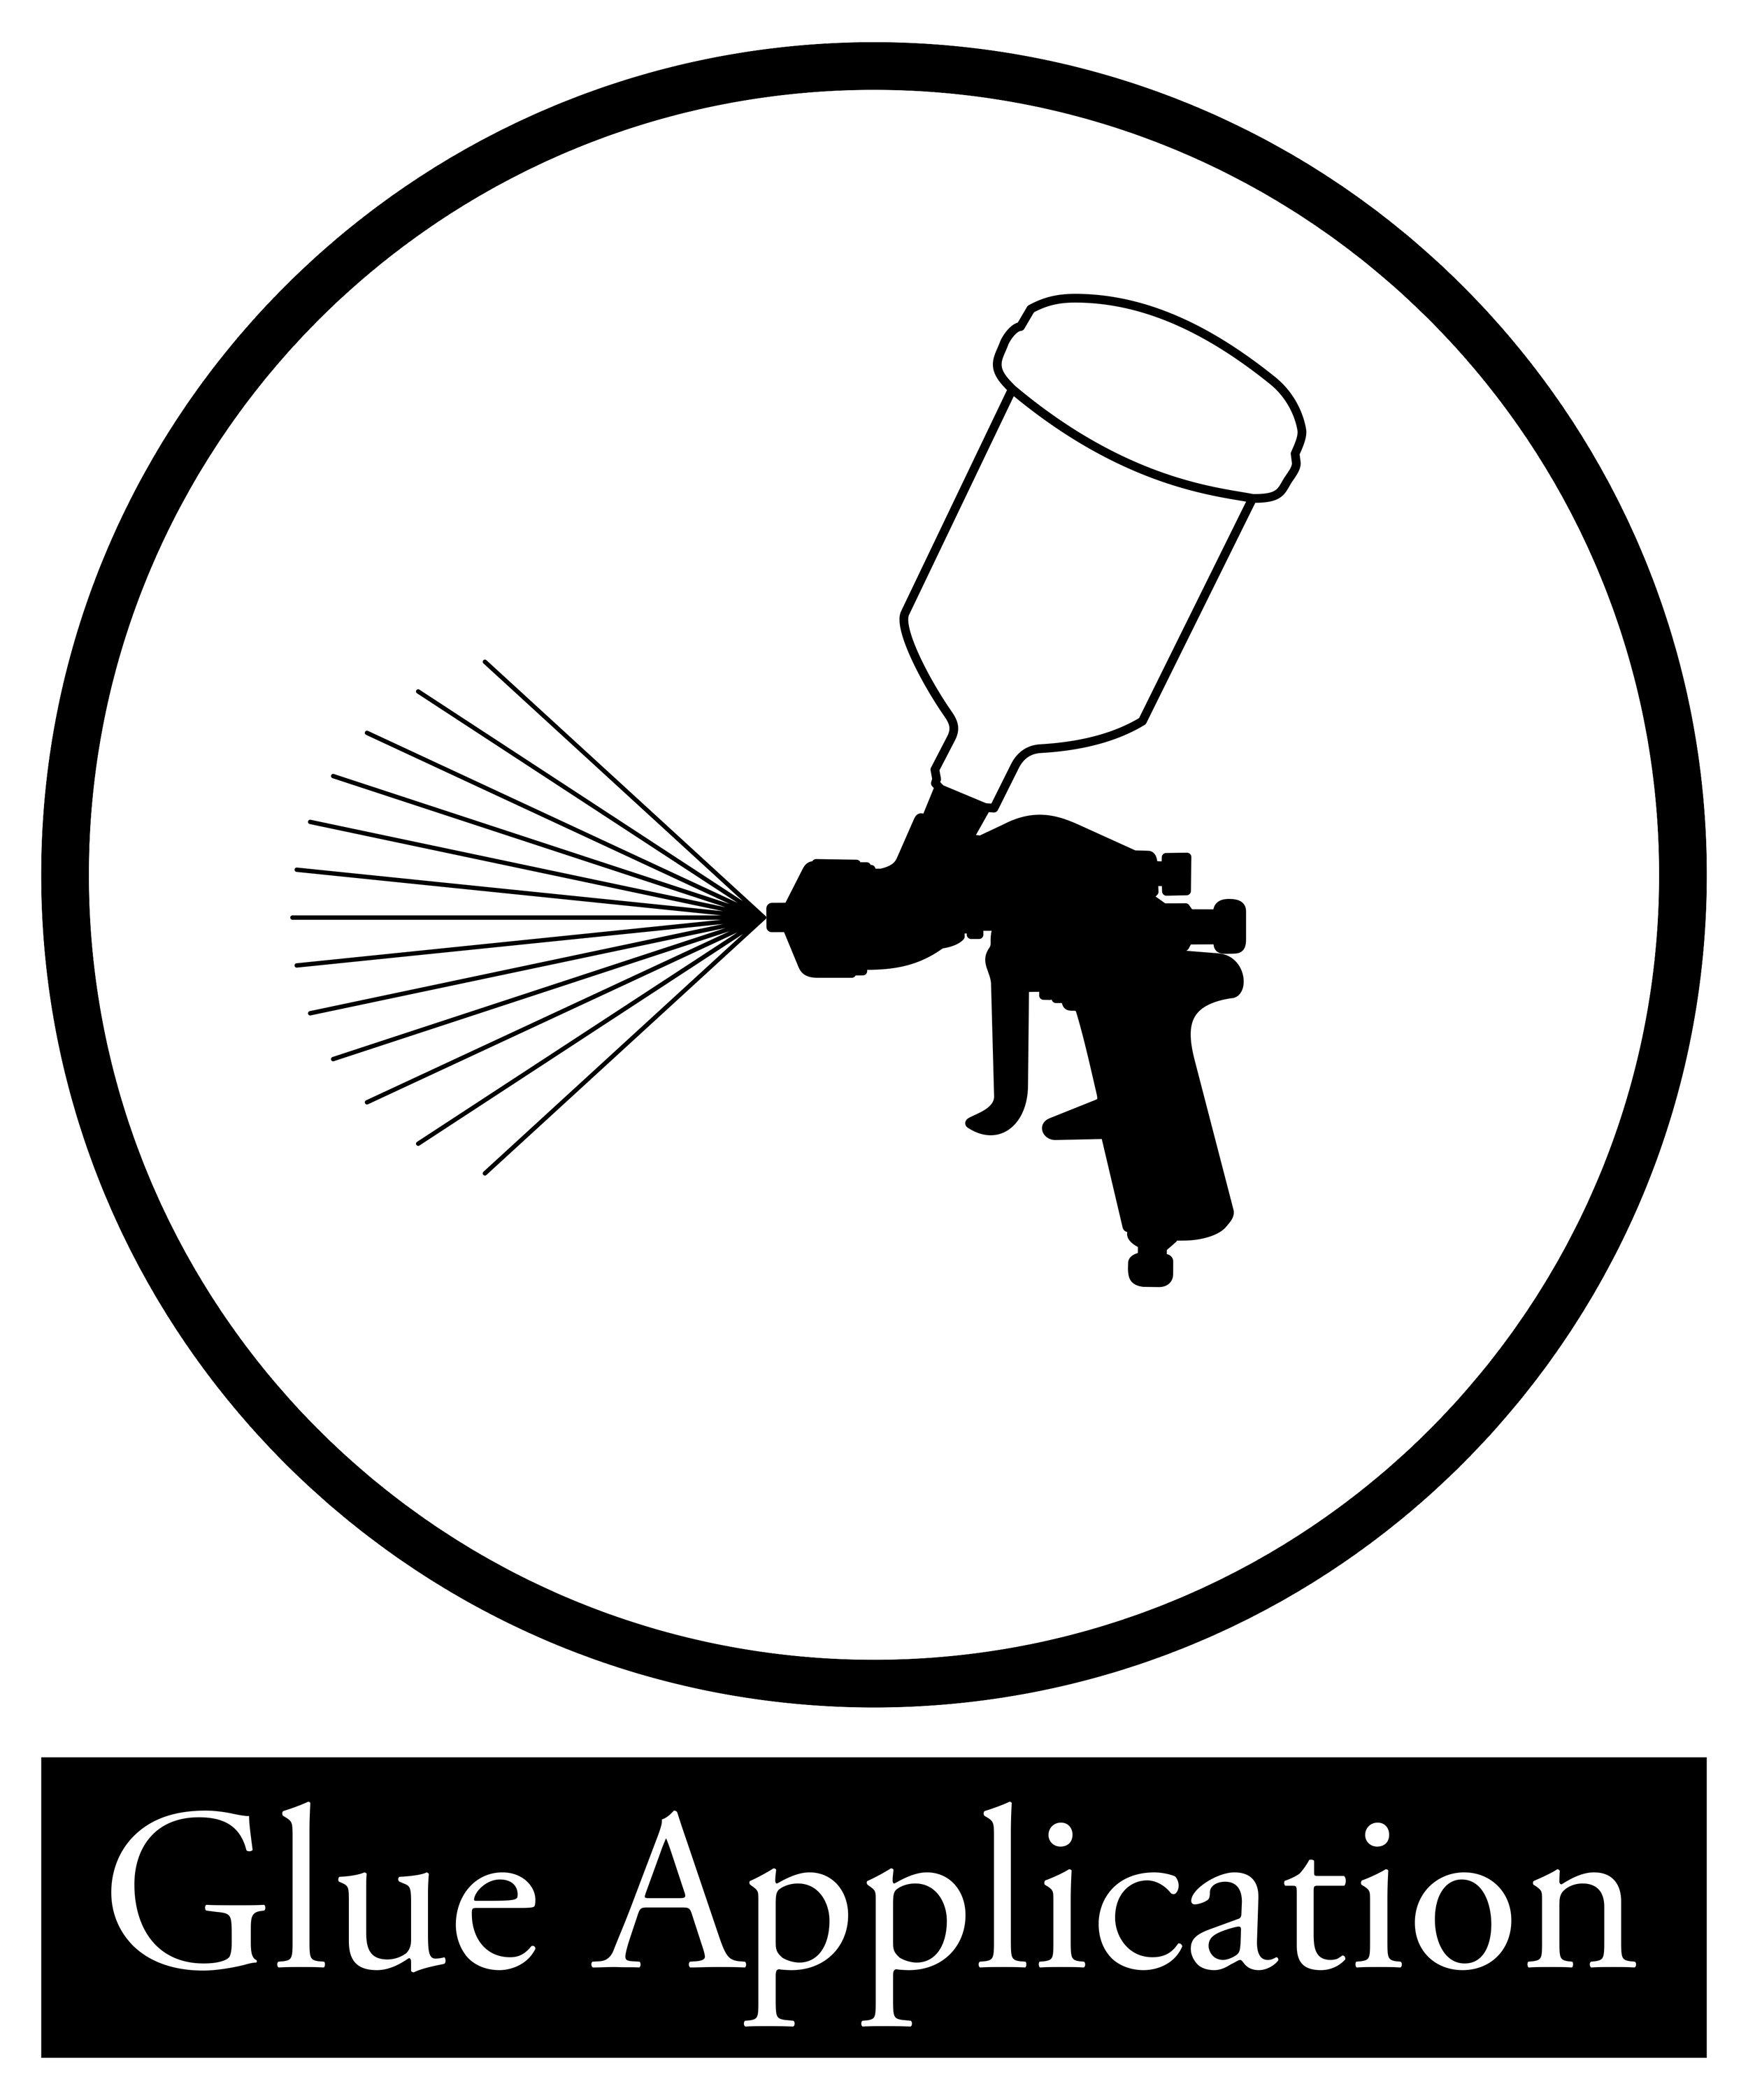 Glue Aplication